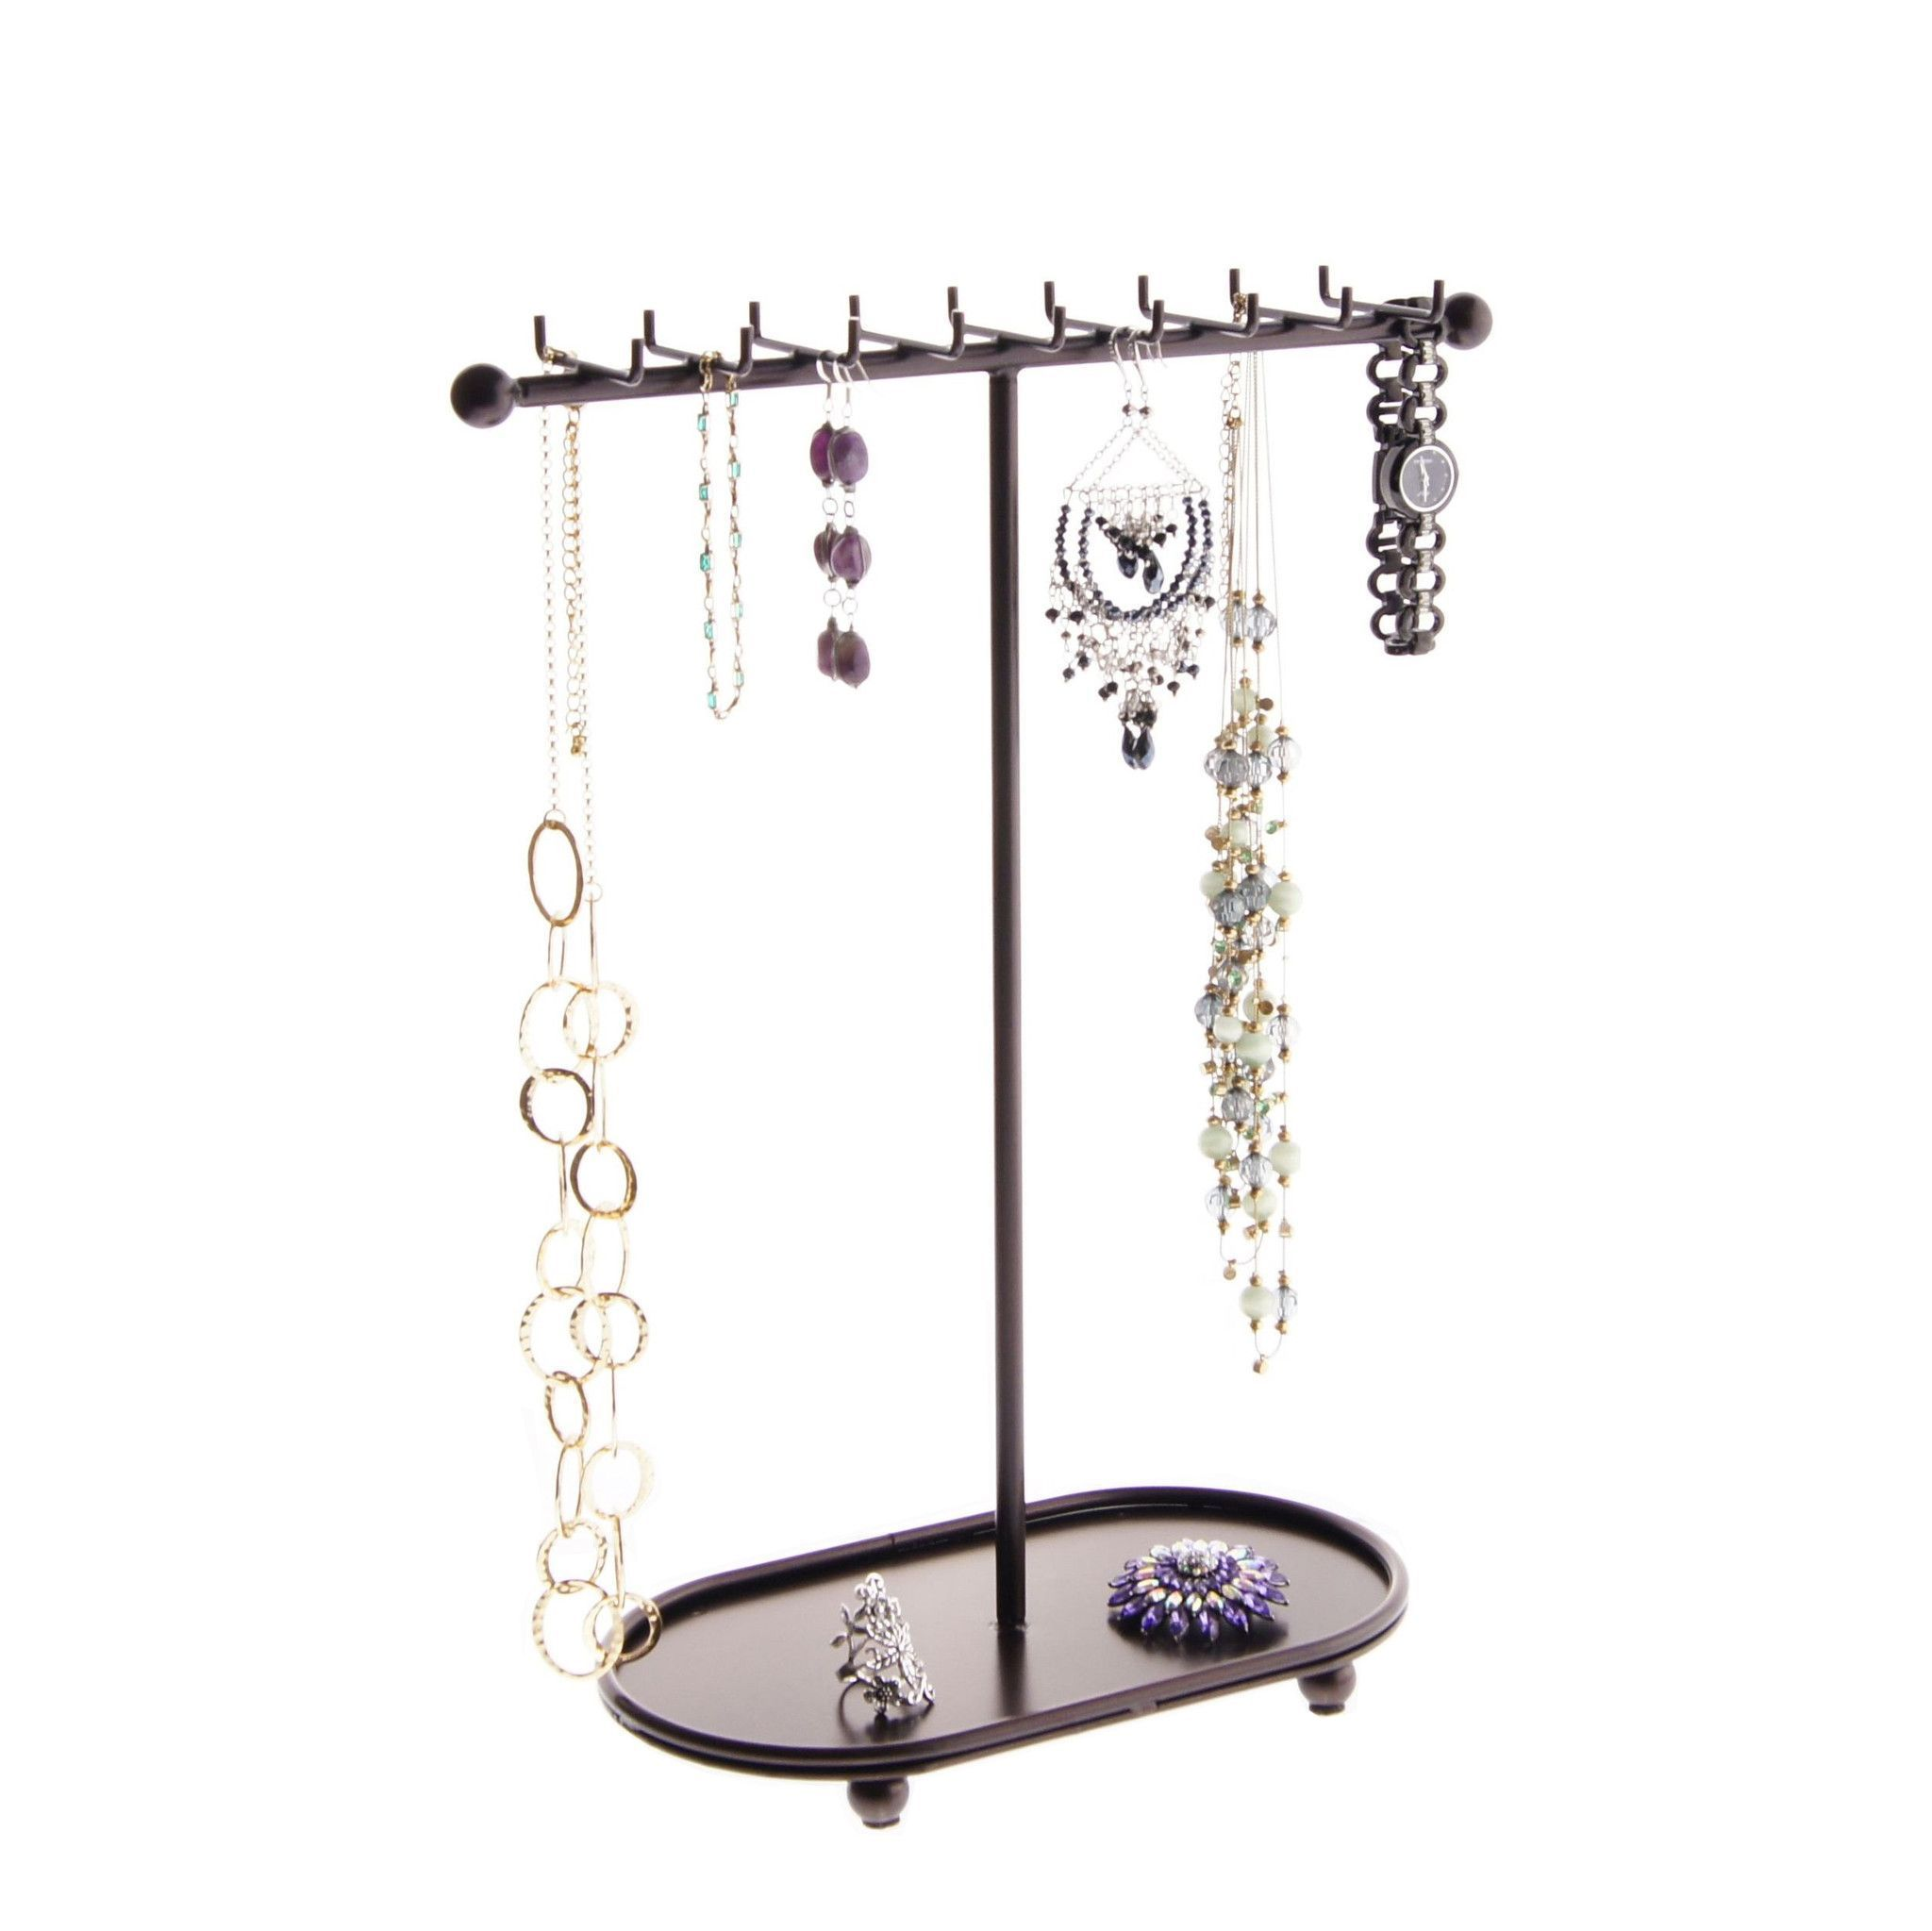 Necklace Holder Organizer Rack